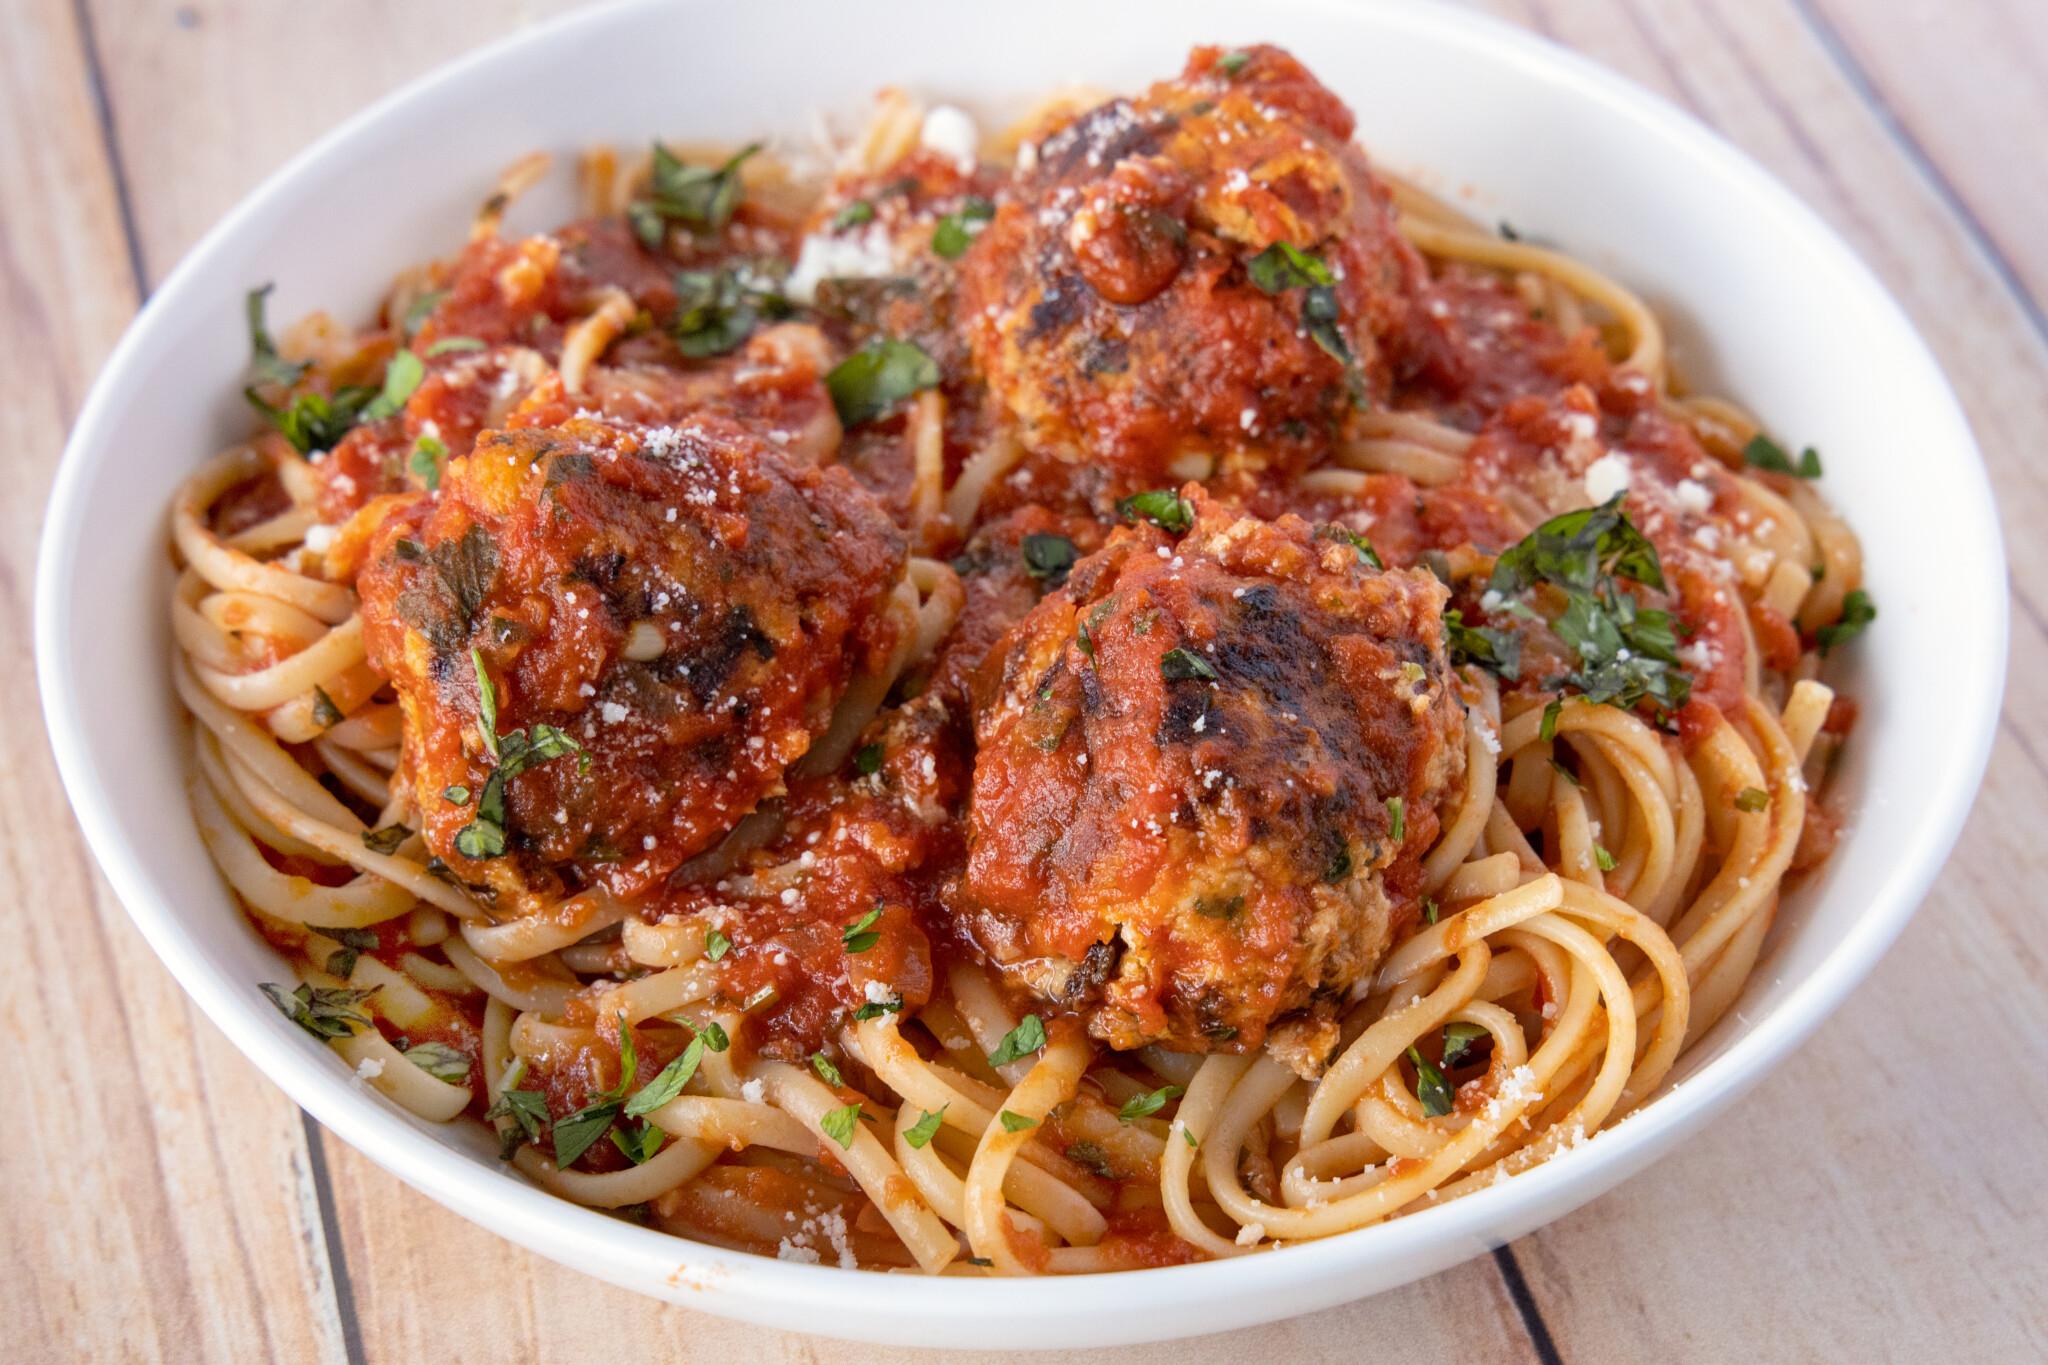 Tuna Meatballs with Linguine and Spicy Marinara Sauce